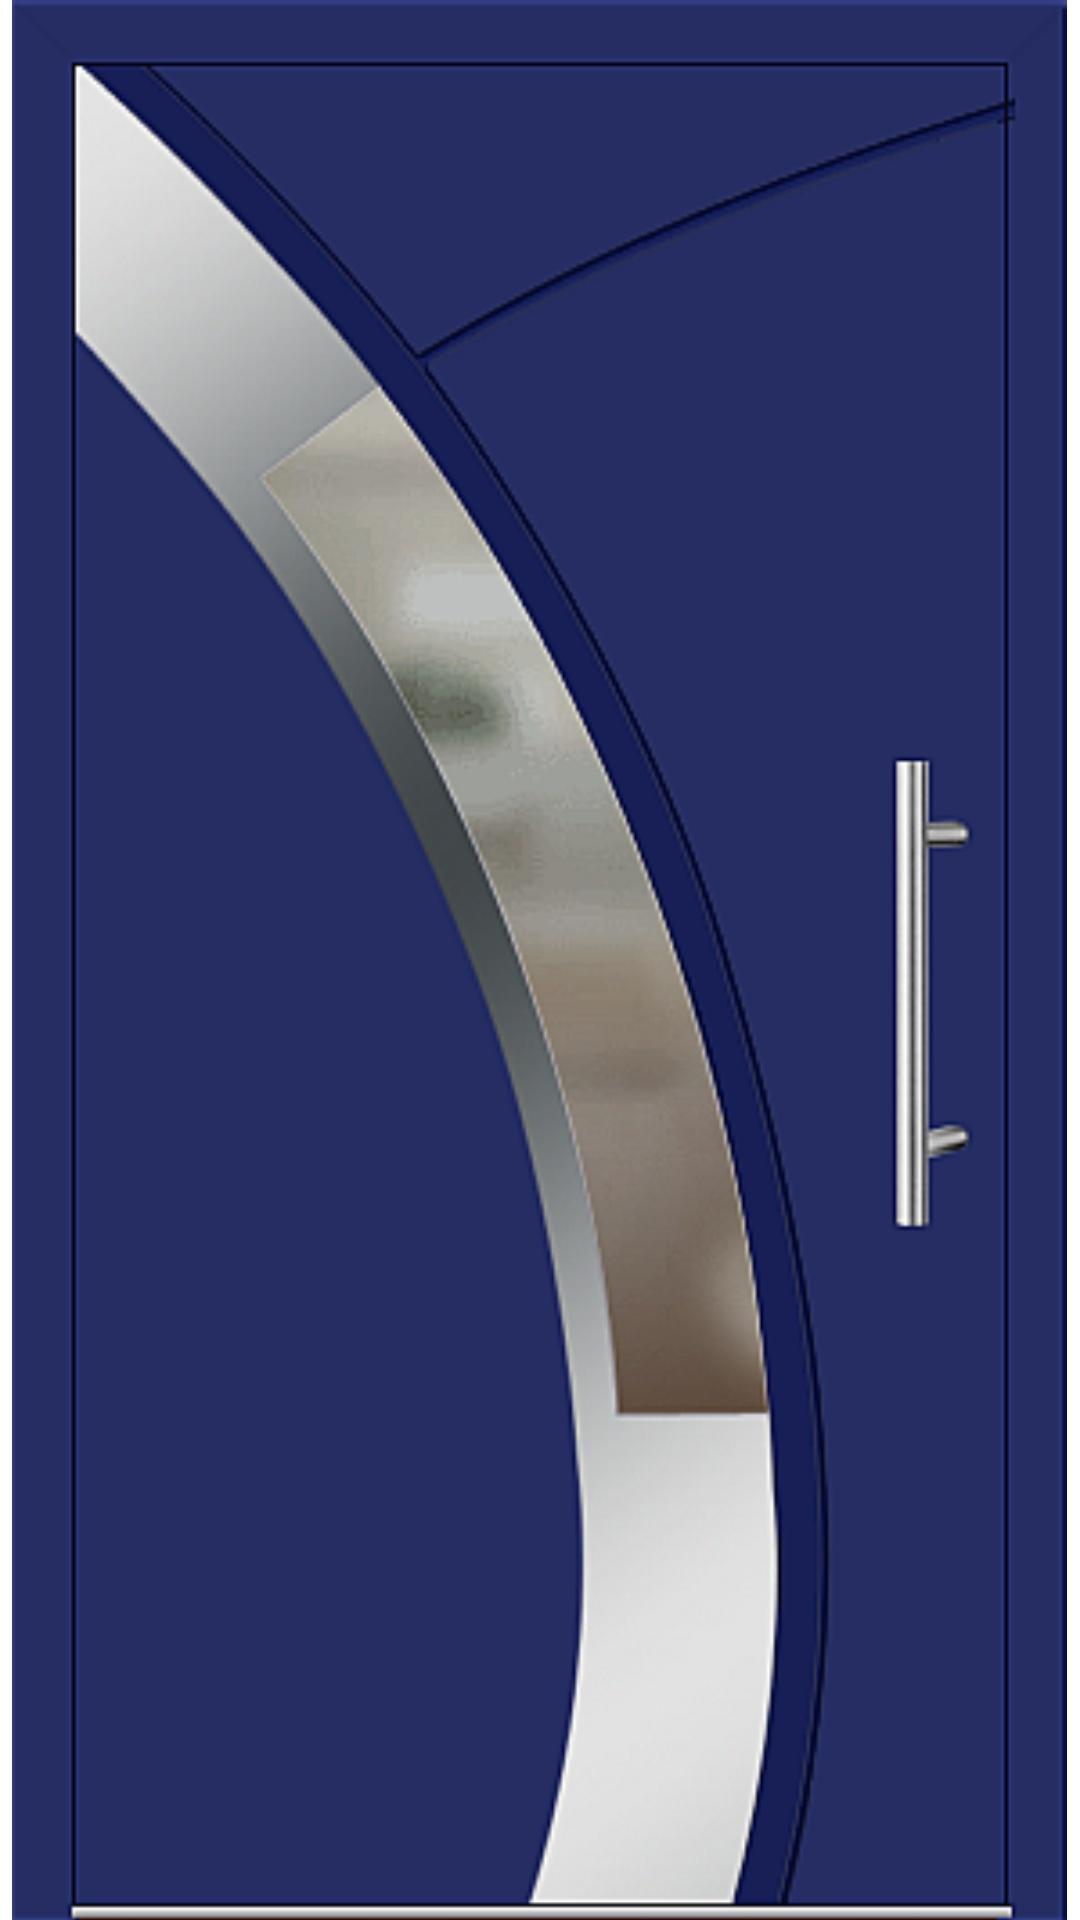 Aluminium Haustür Modell 6438-57 ultramarinblau